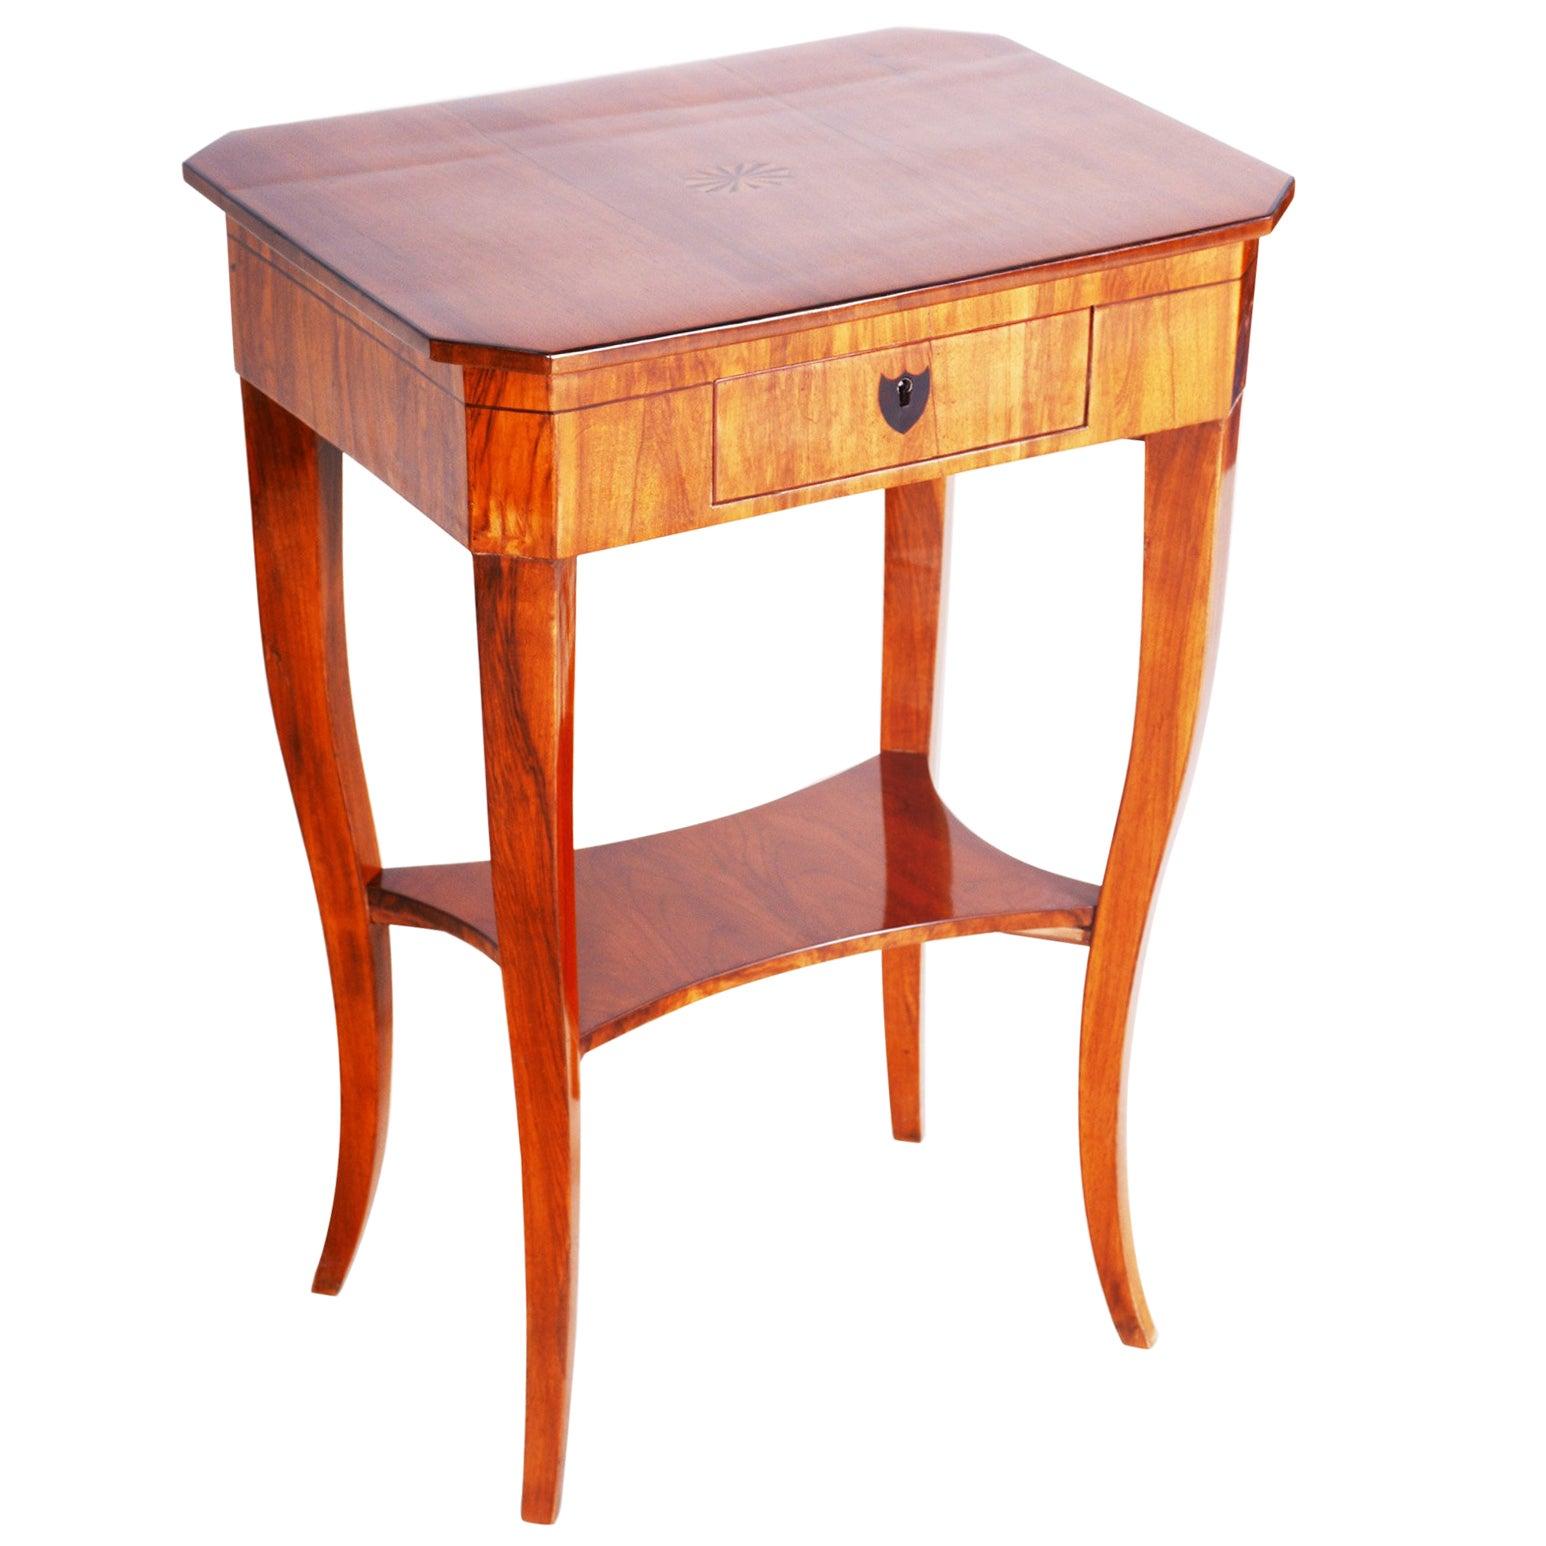 19th Century, Small Walnut Biedermeier Side Table, Austria 1810s, Shellac